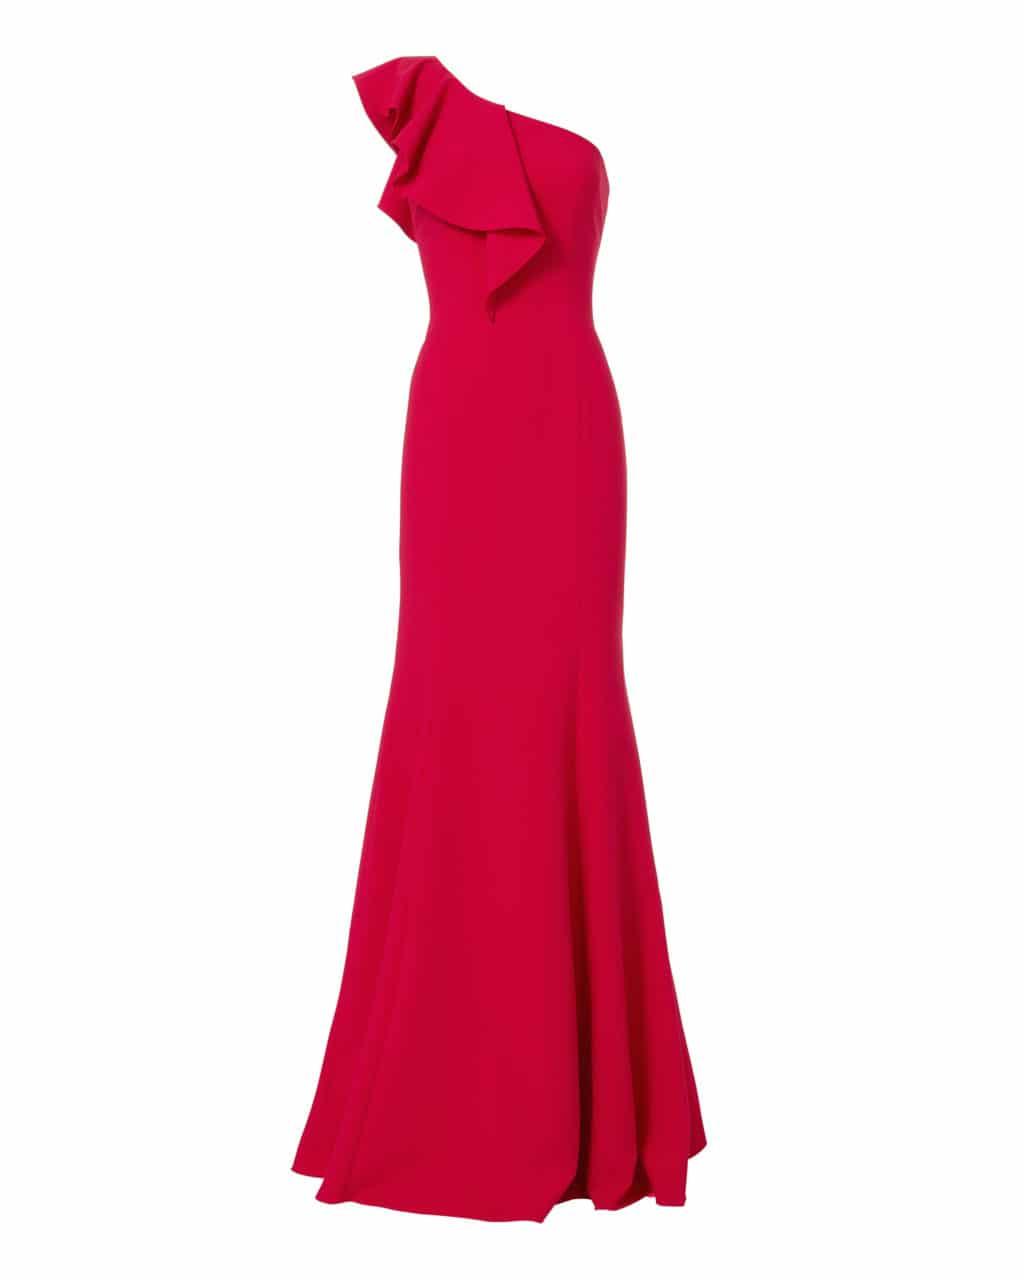 JAY GODFREY Osgood One Shoulder Poppy Red Gown